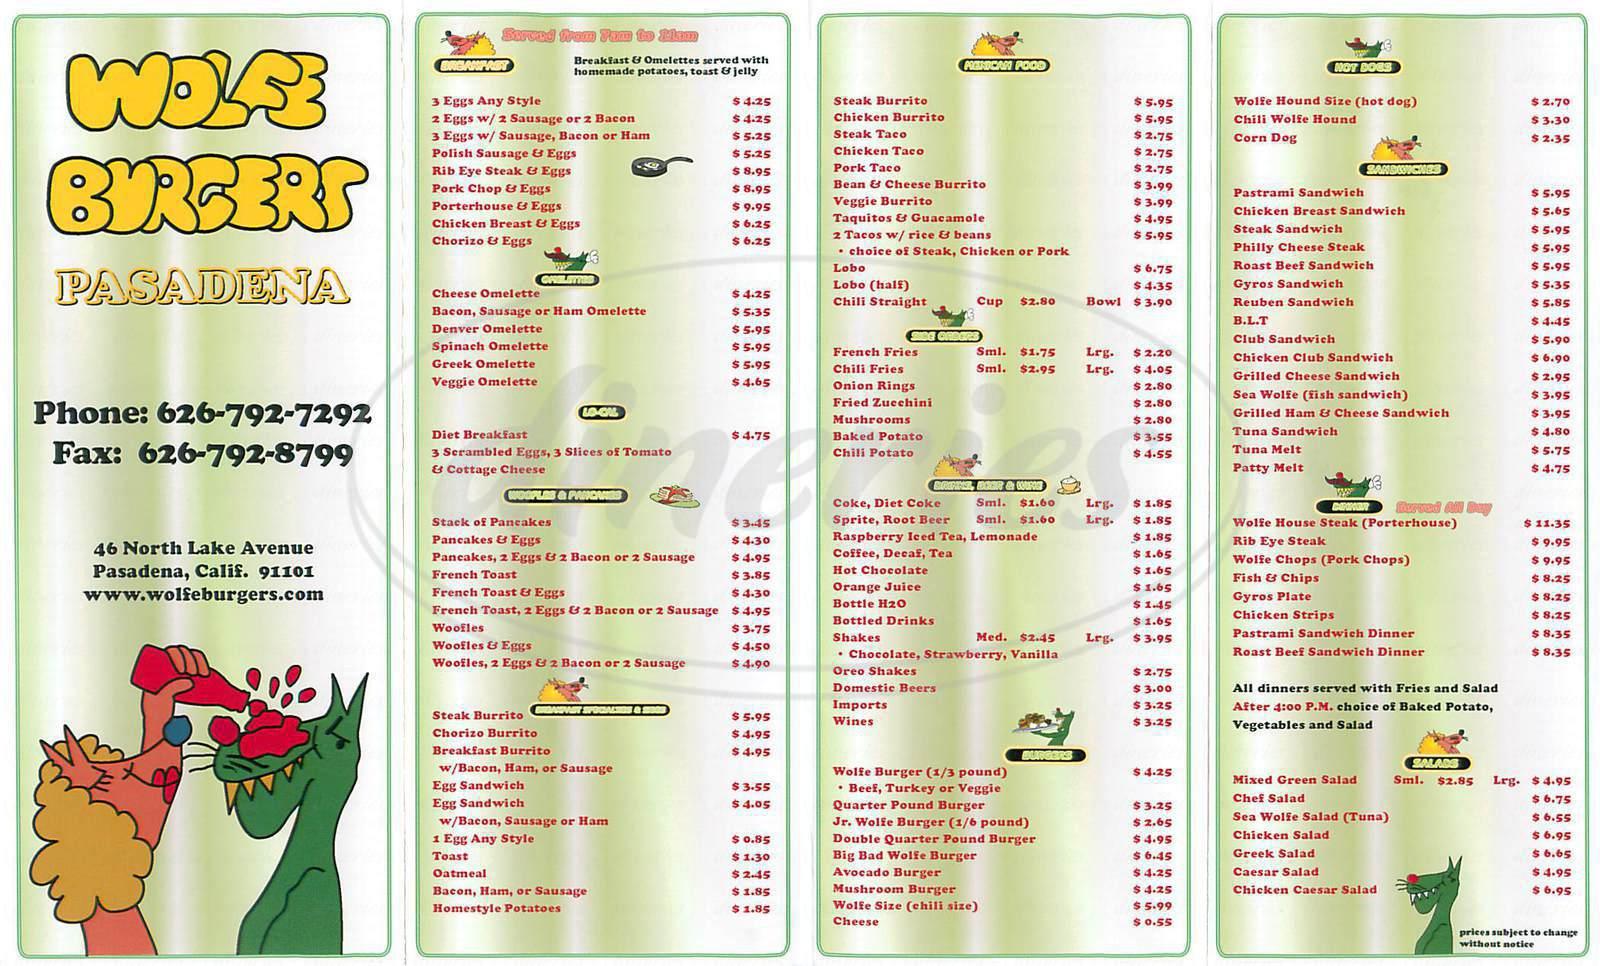 menu for Wolfe Burgers